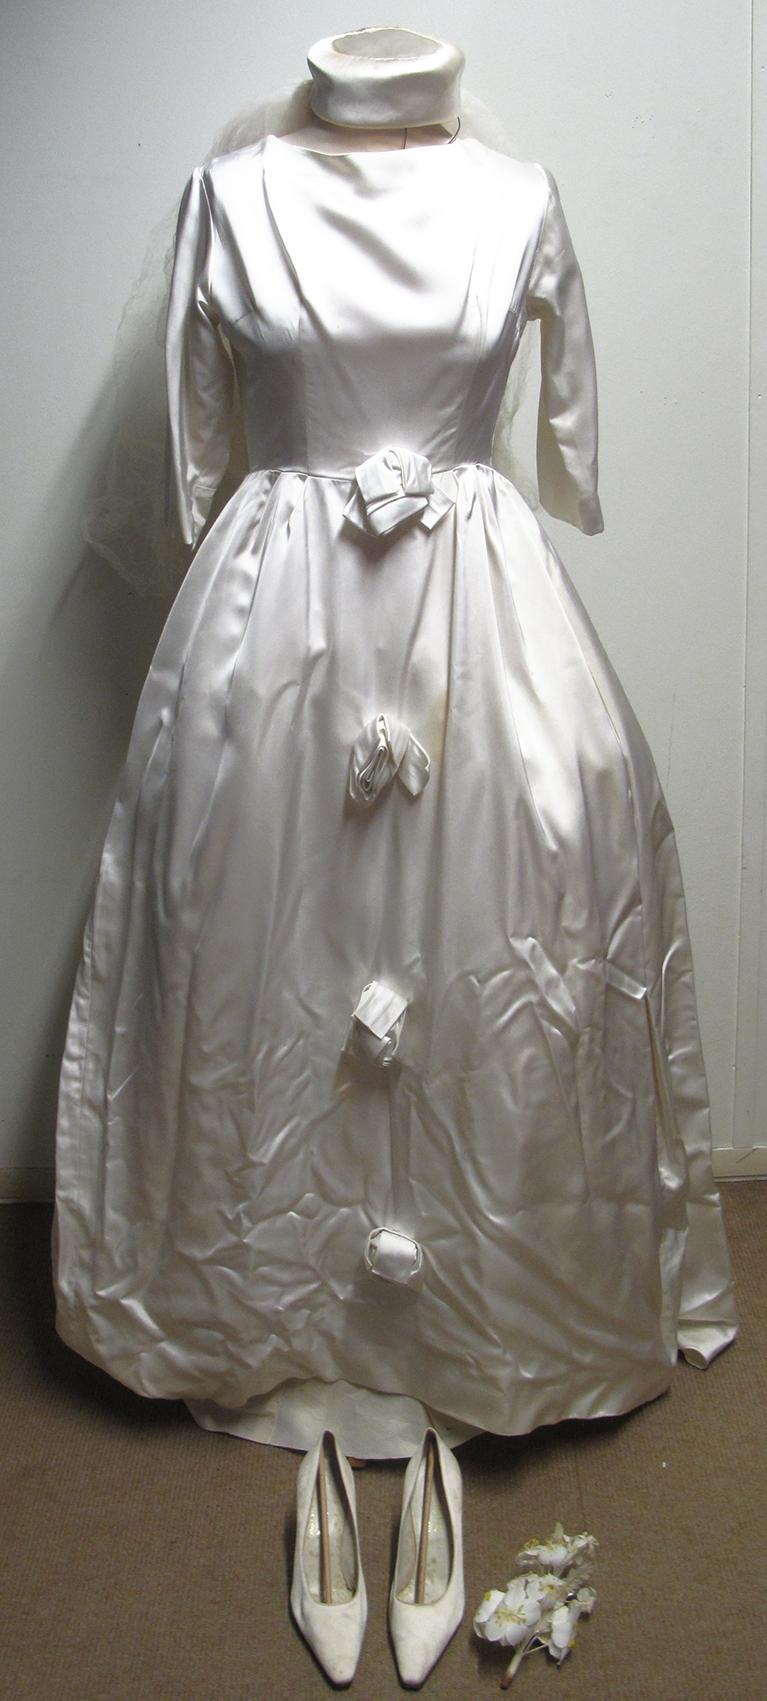 Lot 58 - 1960s Jean Varon vintage cream satin wedding dress with accessories. Estimate £60-80